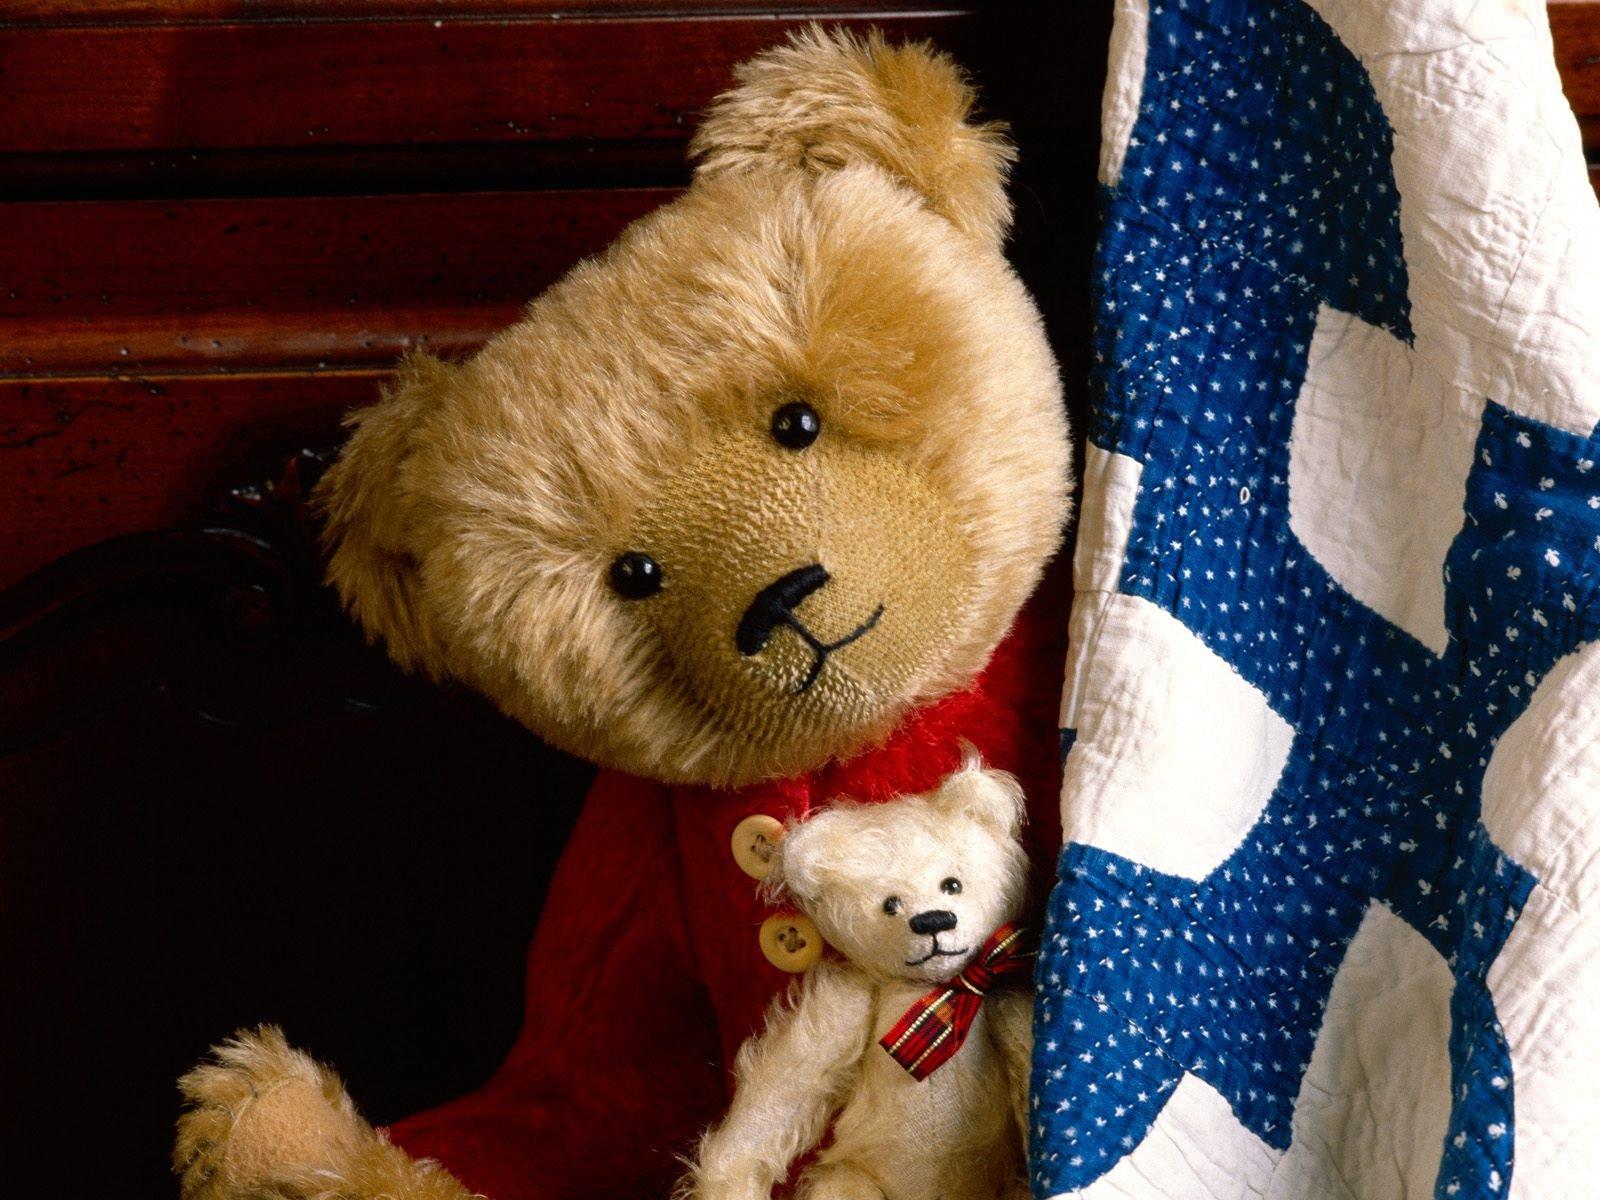 Download Wallpaper Toy Teddy Bear Teddy Iphone Hd 1600x1200